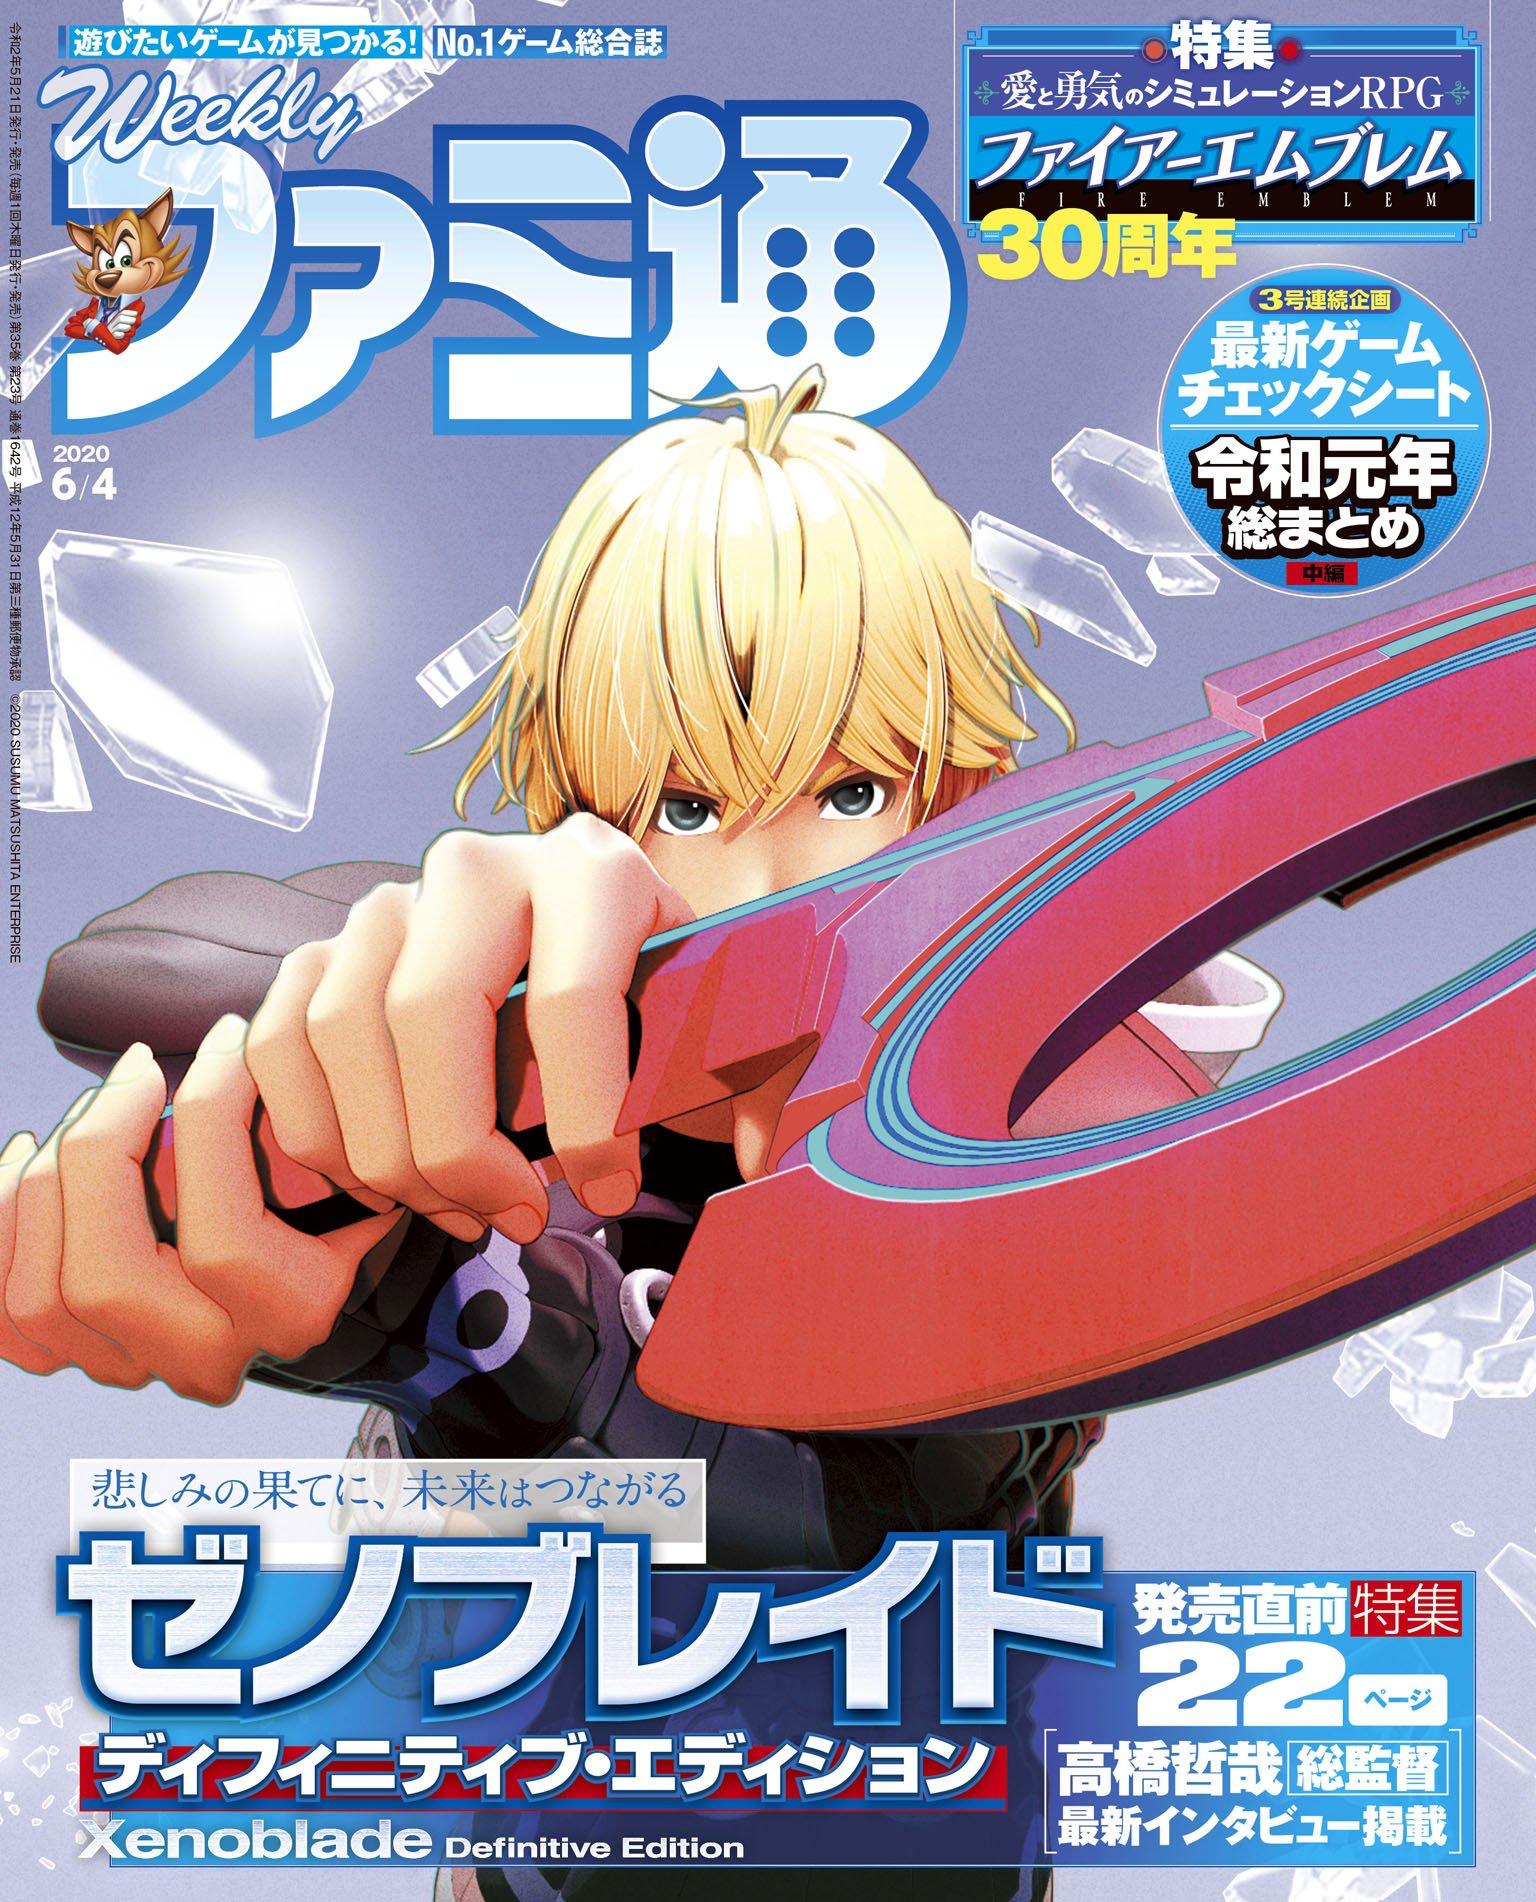 Famitsu 1642 (June 4, 2020)